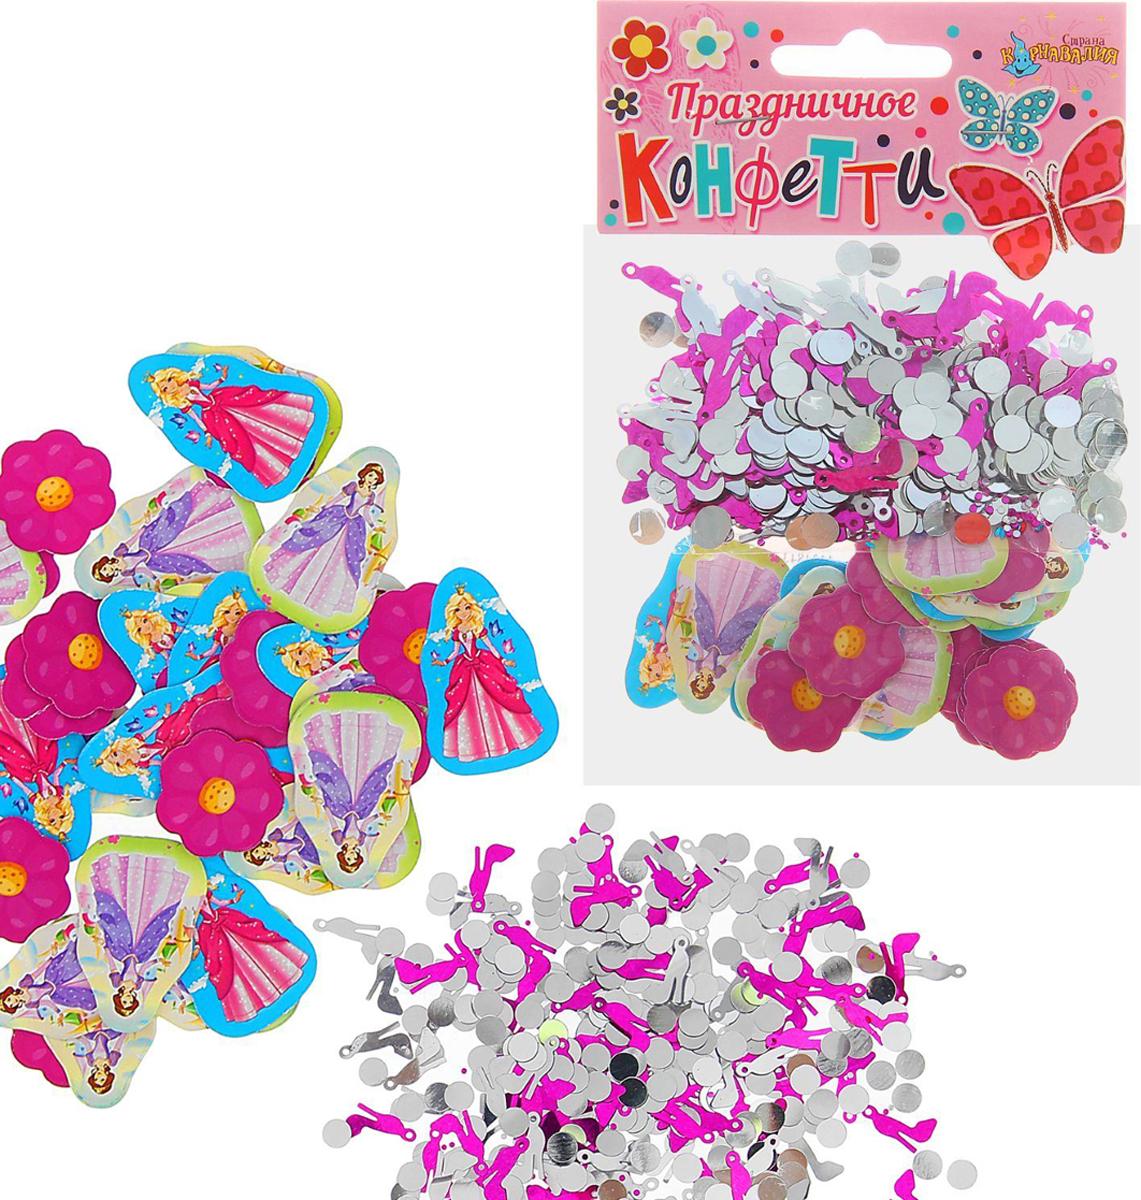 Страна Карнавалия Конфетти Милая принцесса набор 2 пакета + бумажное конфетти 1134843